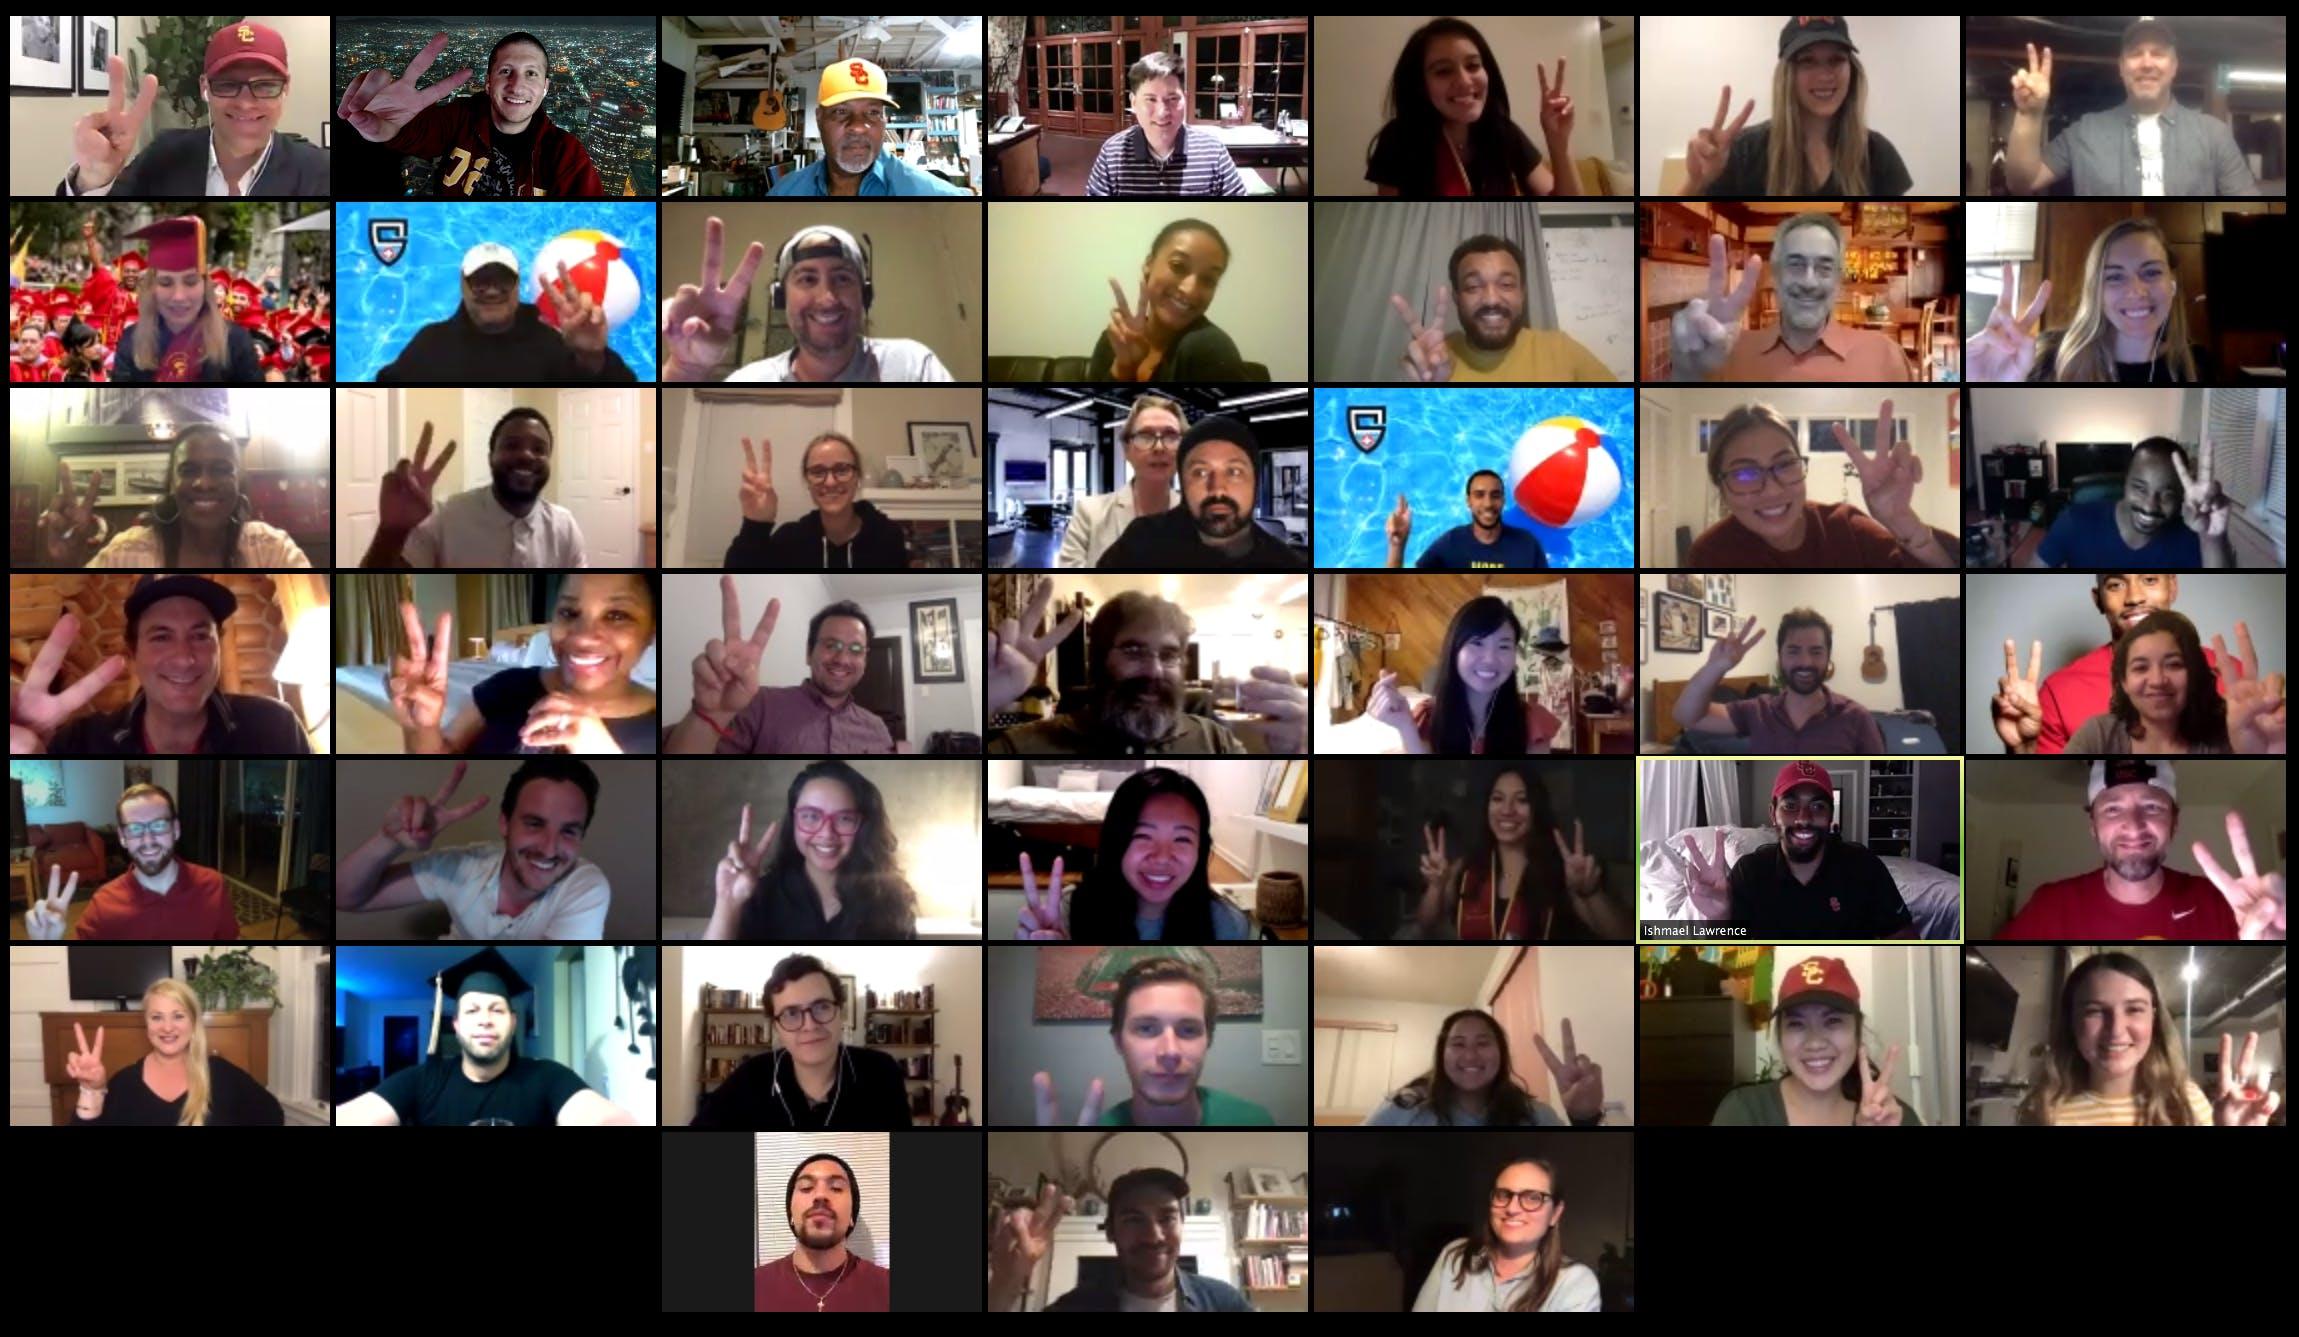 A screenshot of a Zoom meeting.